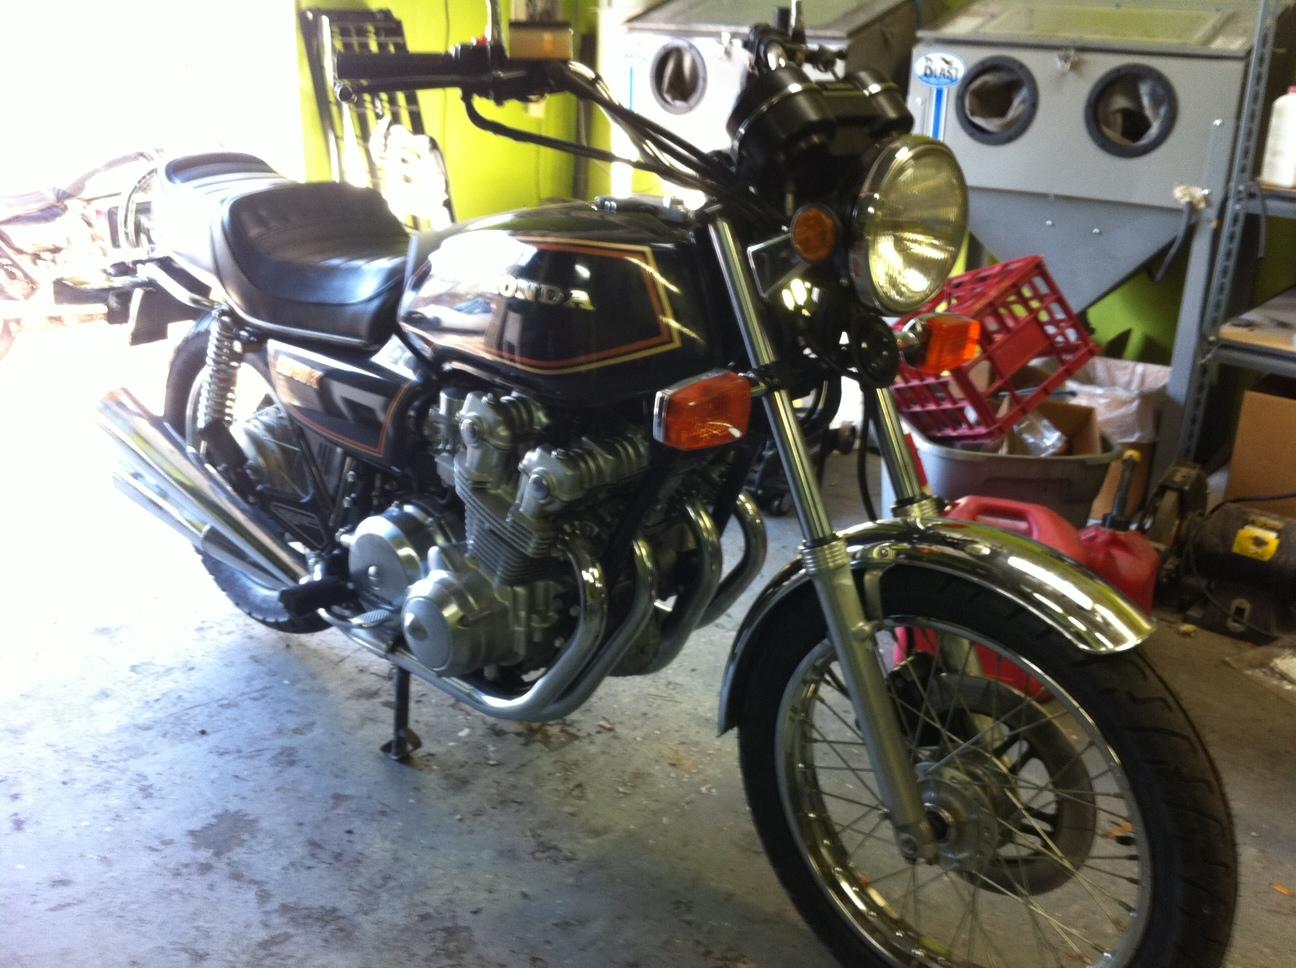 Vintage Japanese Bikes at Limey Bikes in N  Central Austin